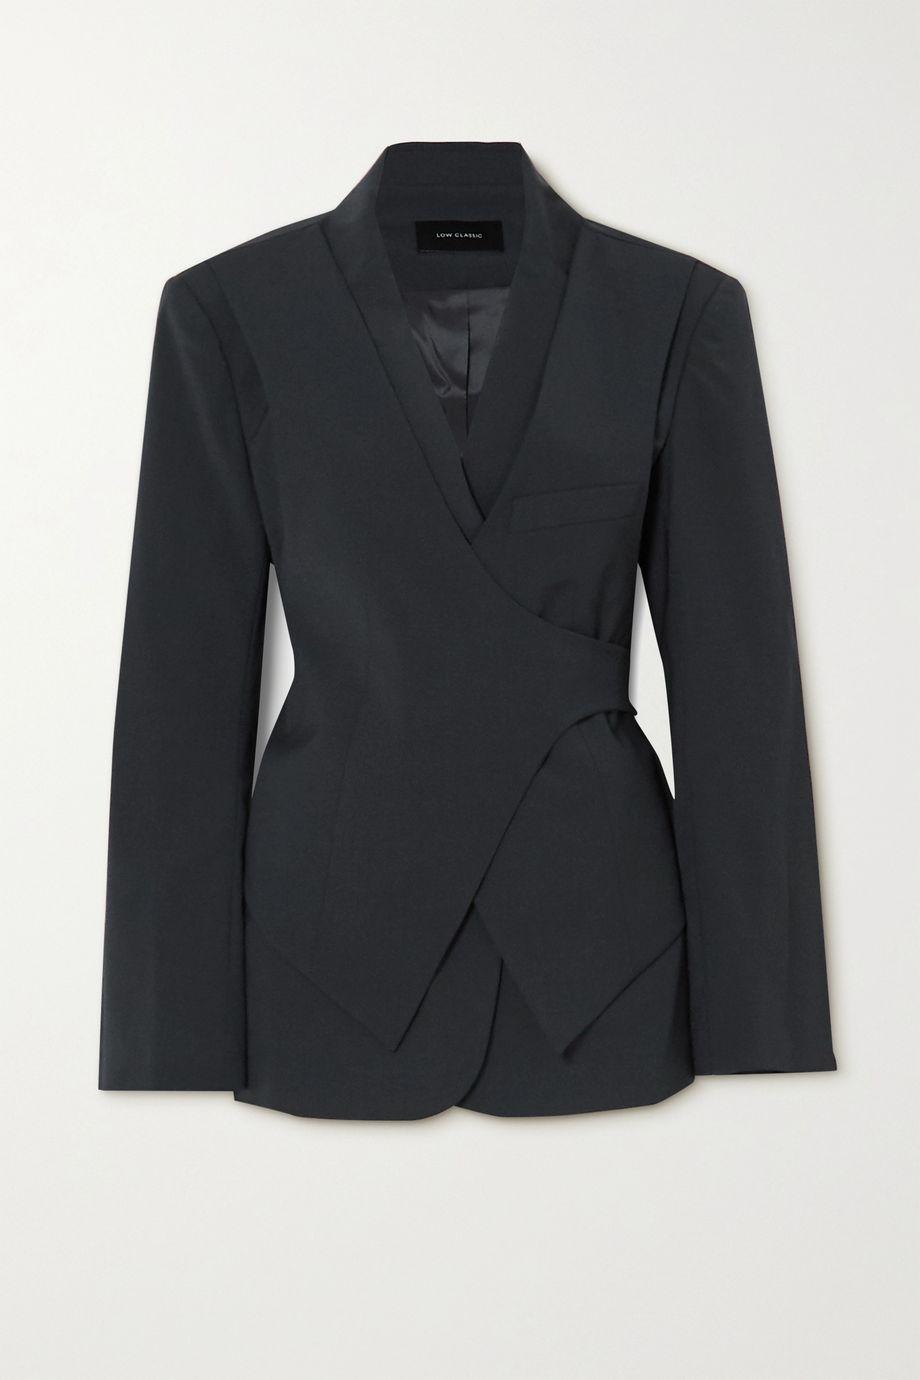 LOW CLASSIC 分层式梭织围裹式西装外套